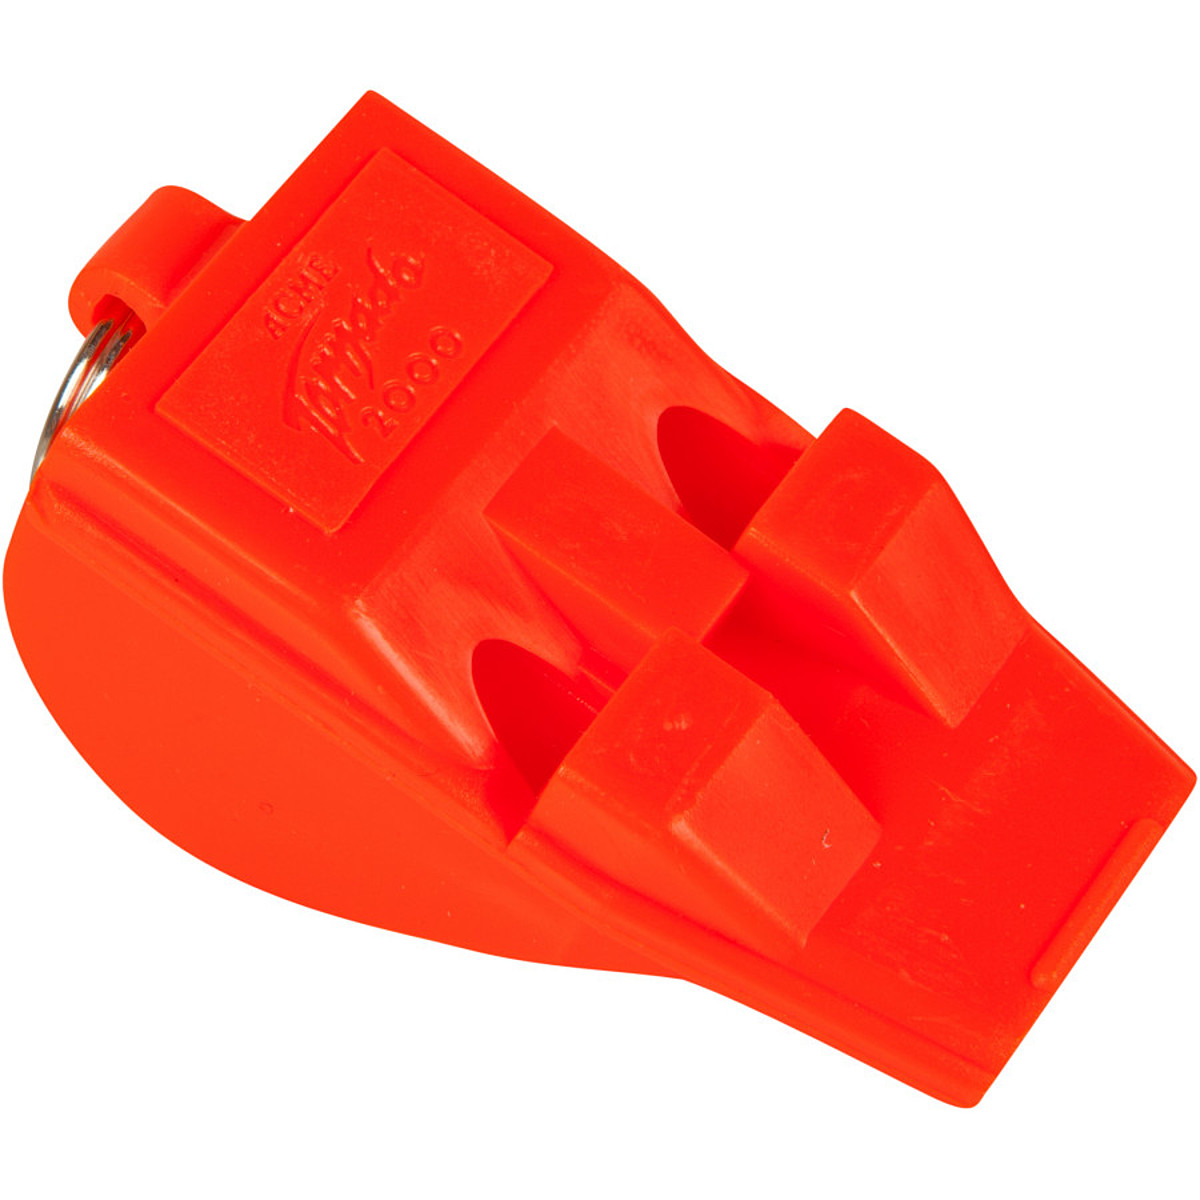 Harmony Acme Tornado T2000 Whistle